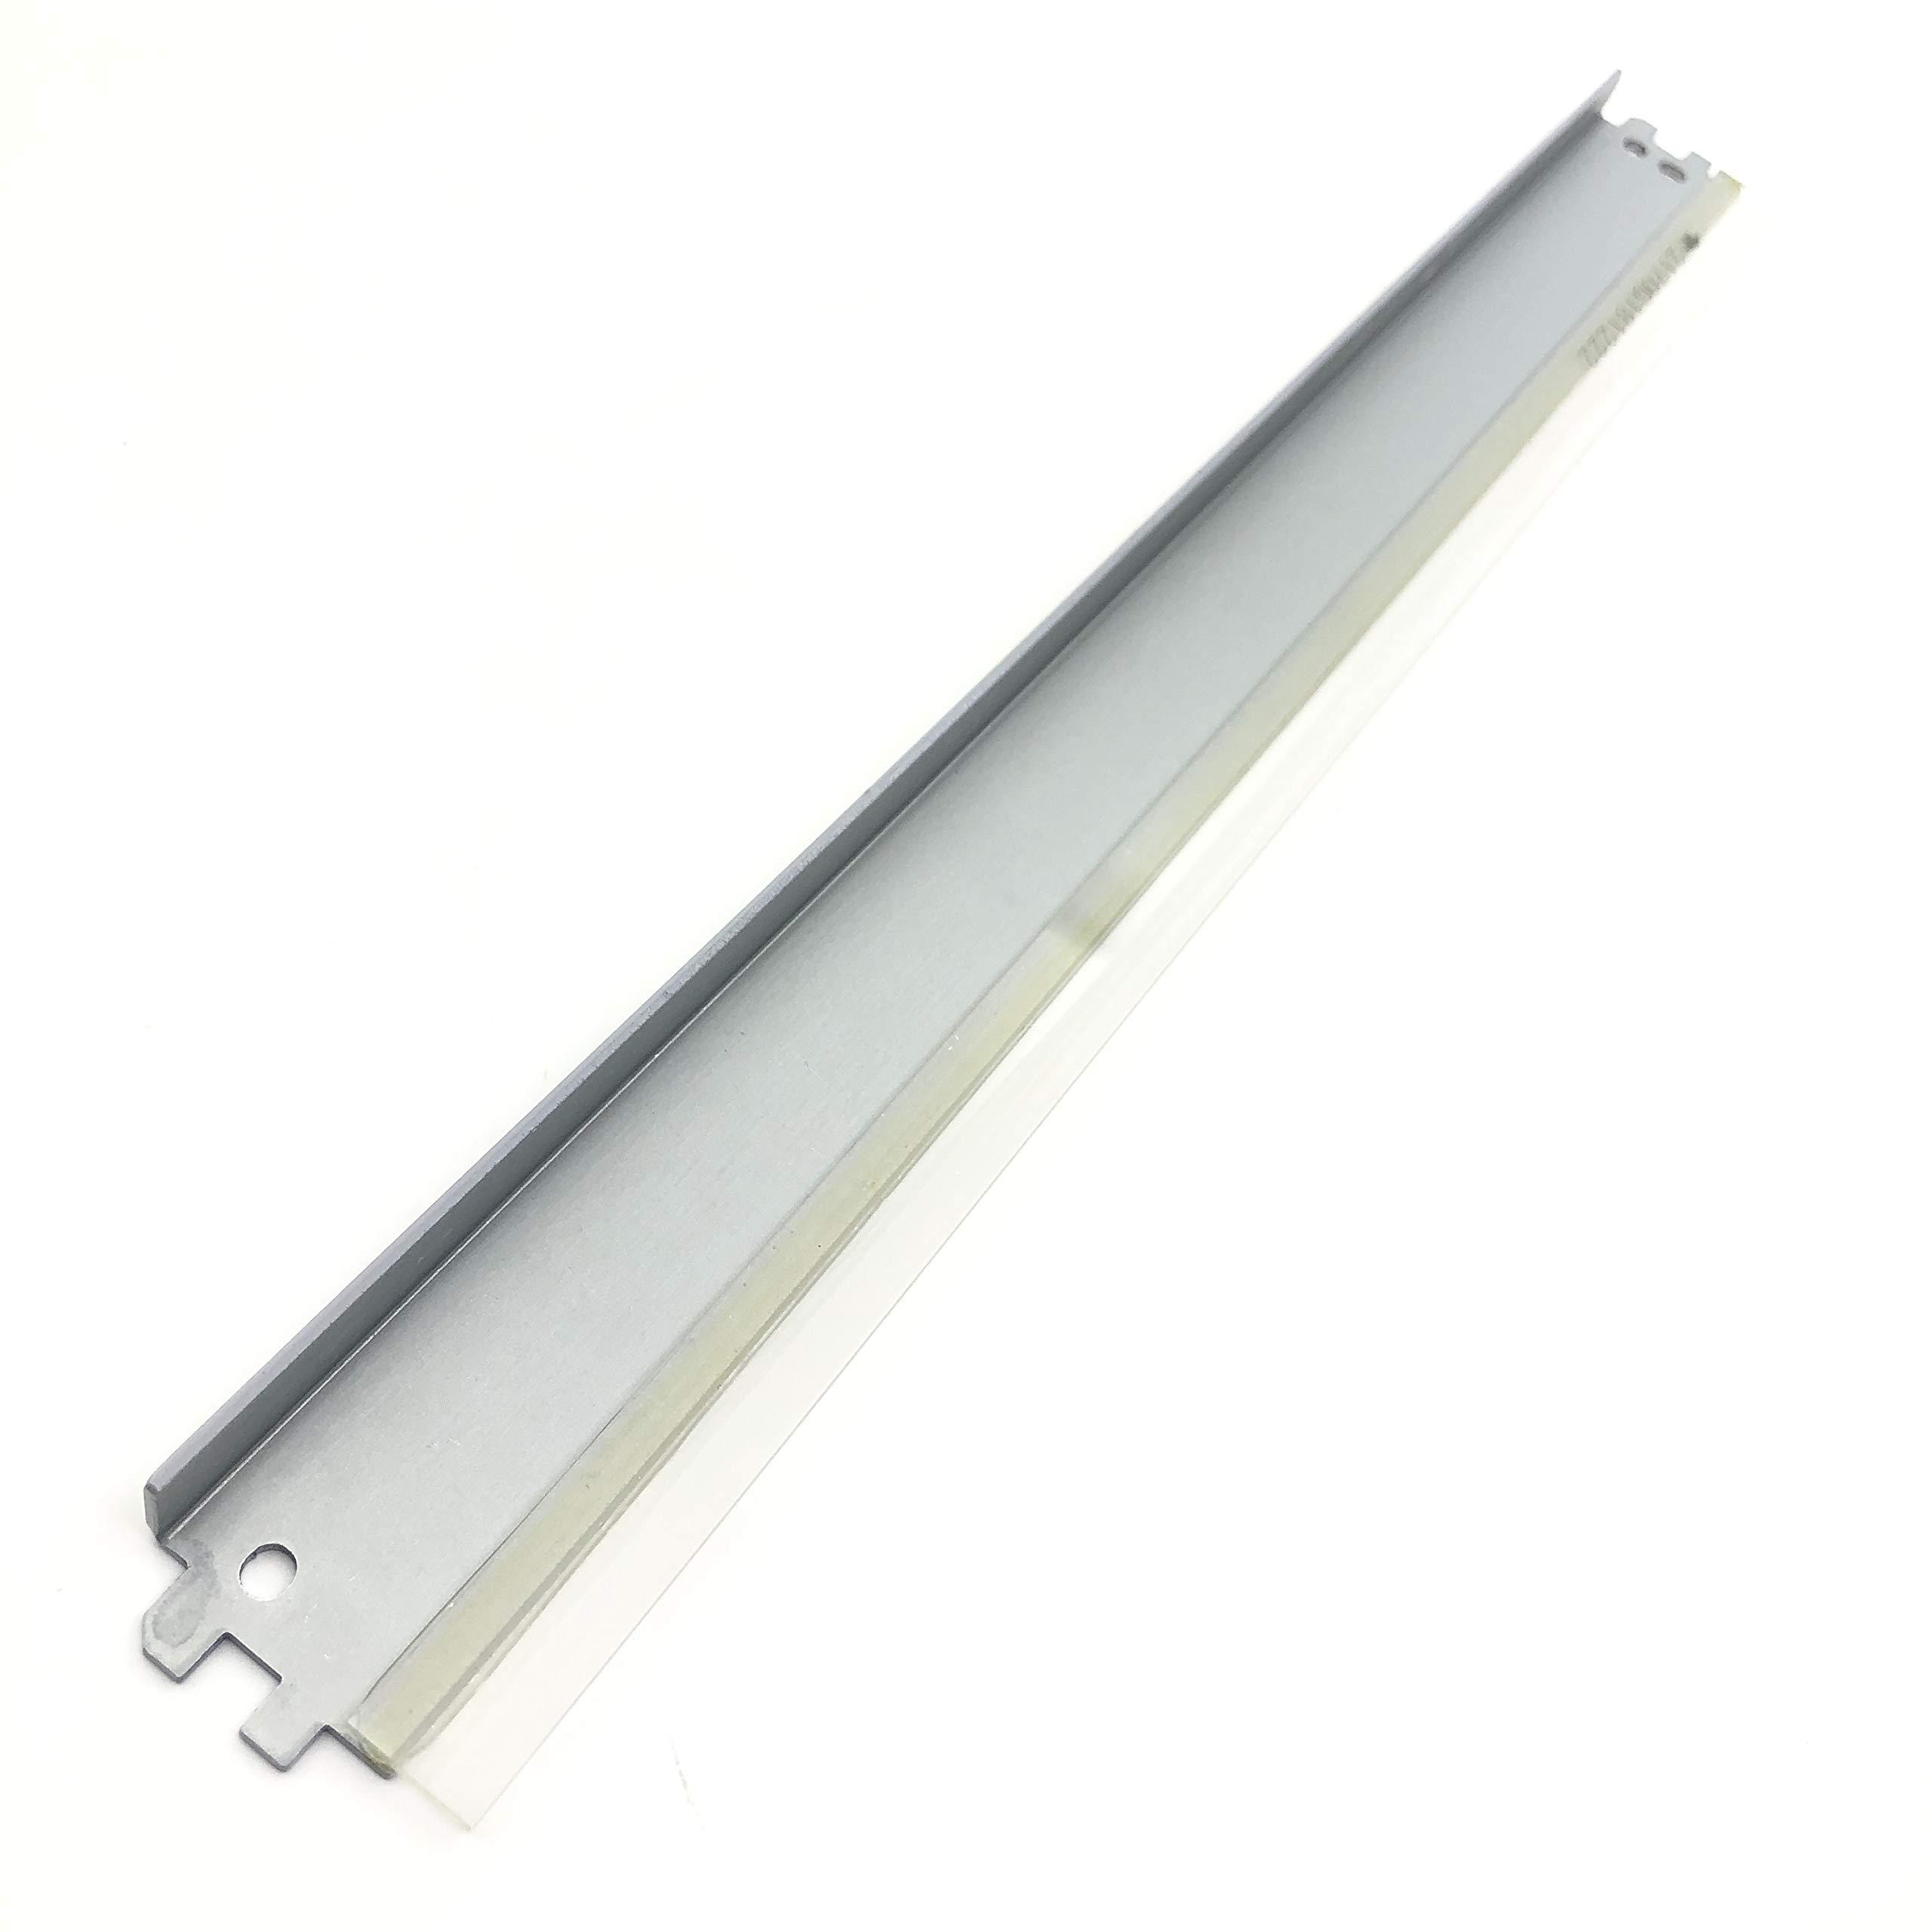 OKLILI 5PC X Transfer Belt Cleaning Blade for HP Color Laserjet CM6030f CM6040f CM6049f CP6015dn CP6015de CP6015n CP6015x CP6015xh Photosmart CL2000